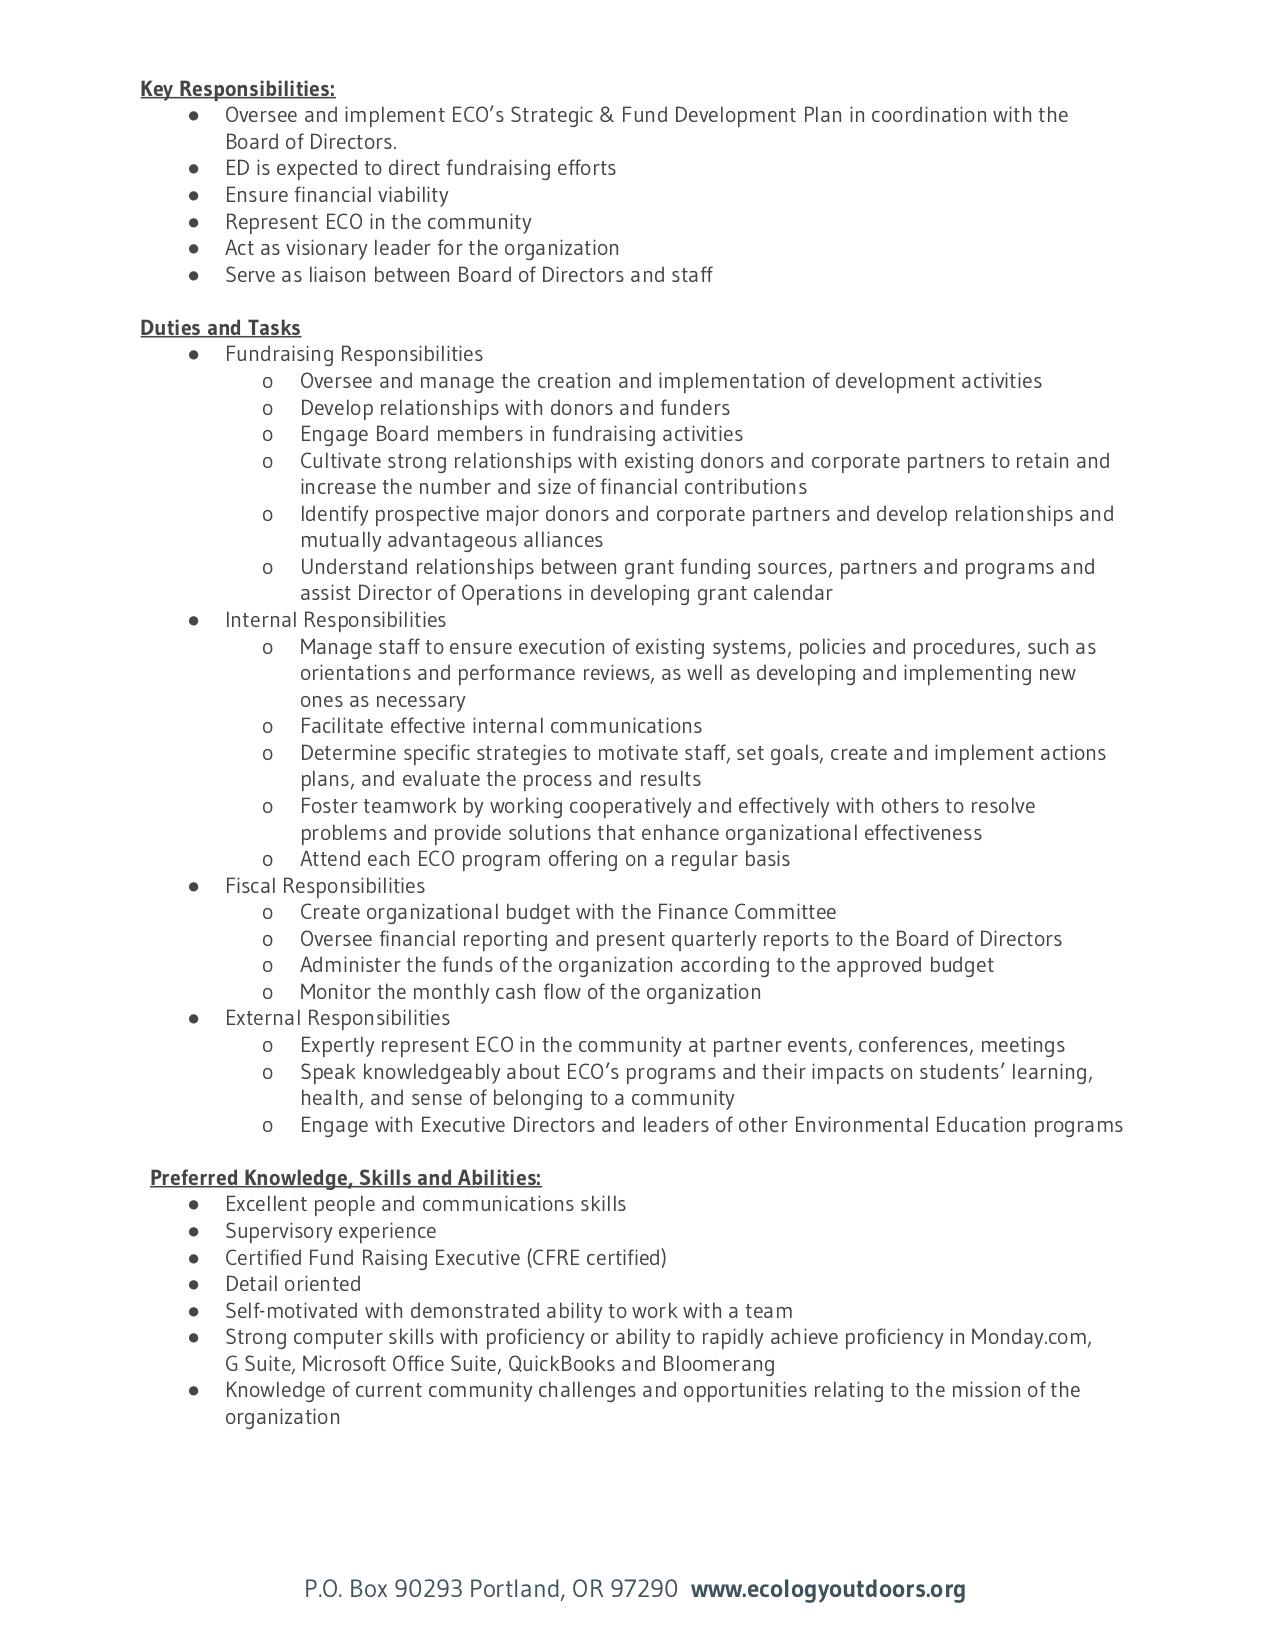 2019 Executive Director Job Description pg2.jpg